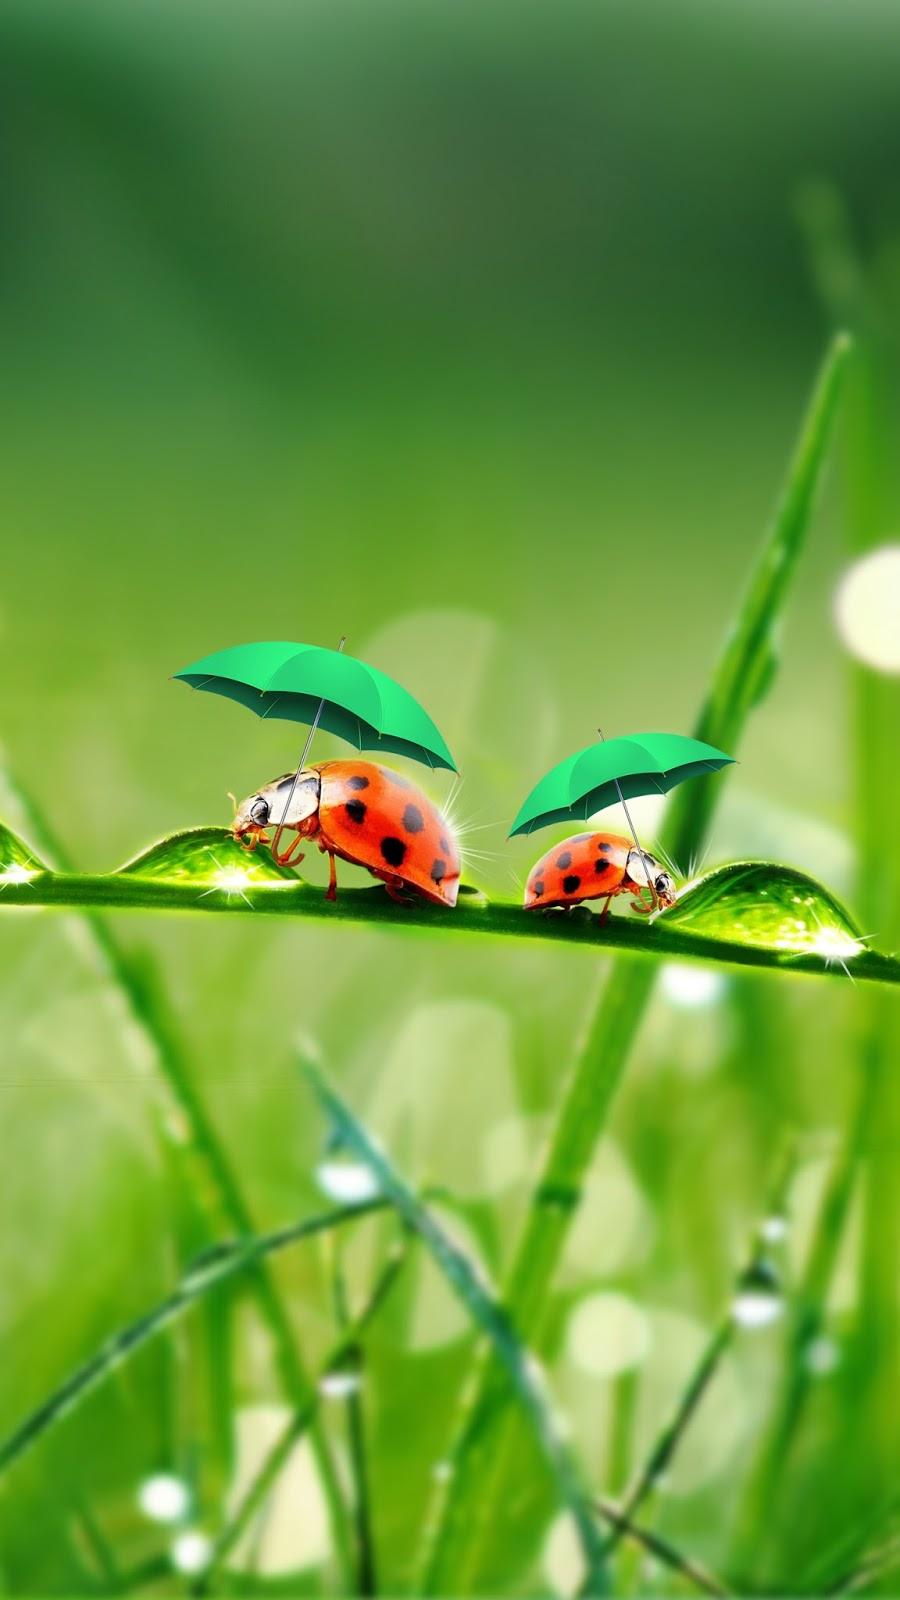 Free Wallpaper Phone: Ladybug Wallpaper Samsung Galaxy J7